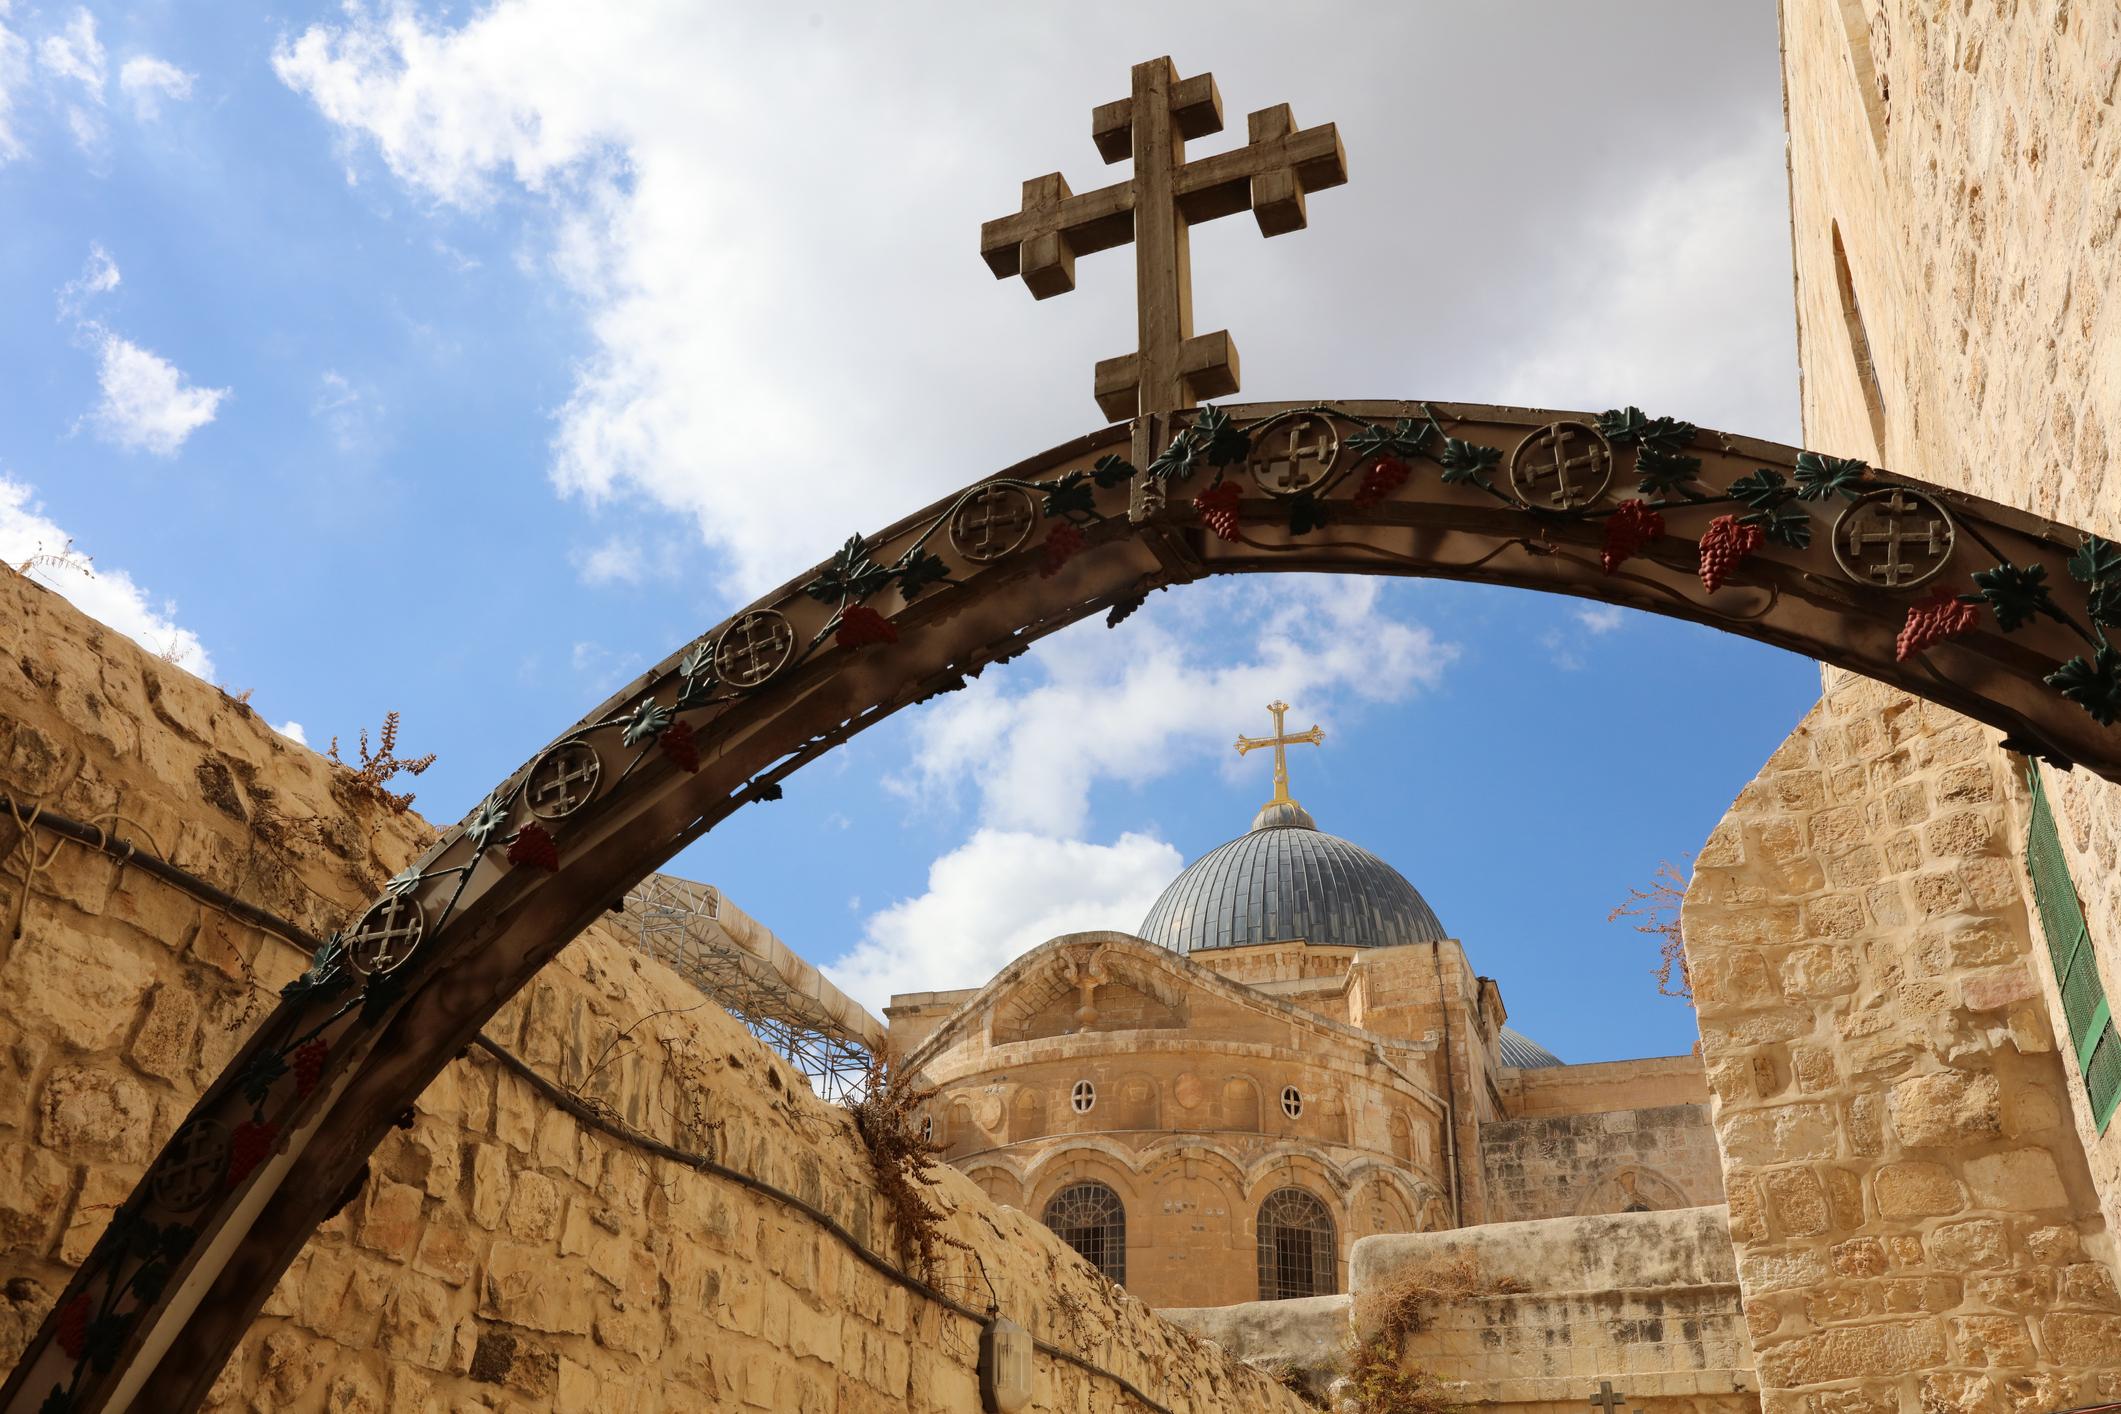 A journey through the Holy Land with Catholic novelist Ron